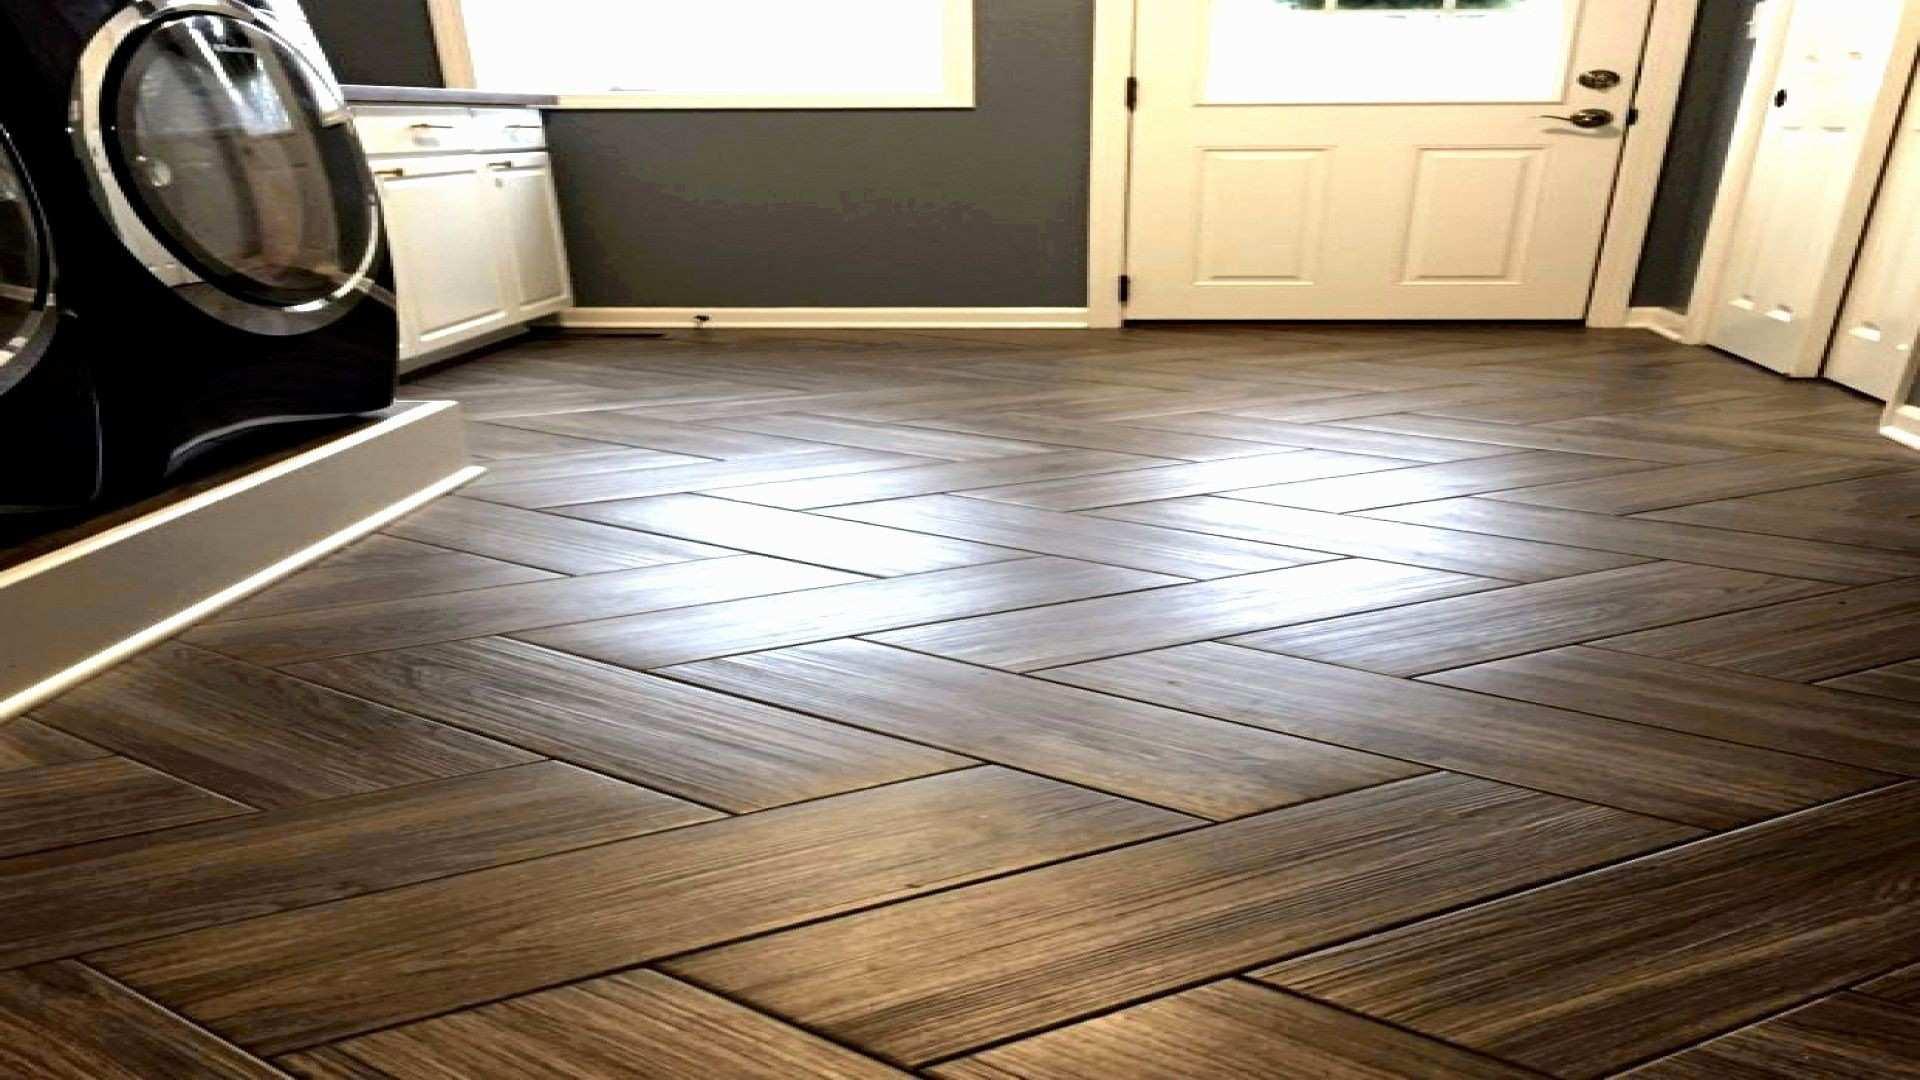 bamboo vs engineered hardwood flooring of 30 lovely laminate flooring vs wood swansonsfuneralhomes com for laminate flooring vs wood lovely 40 best way to remove vinyl flooring from concrete concept